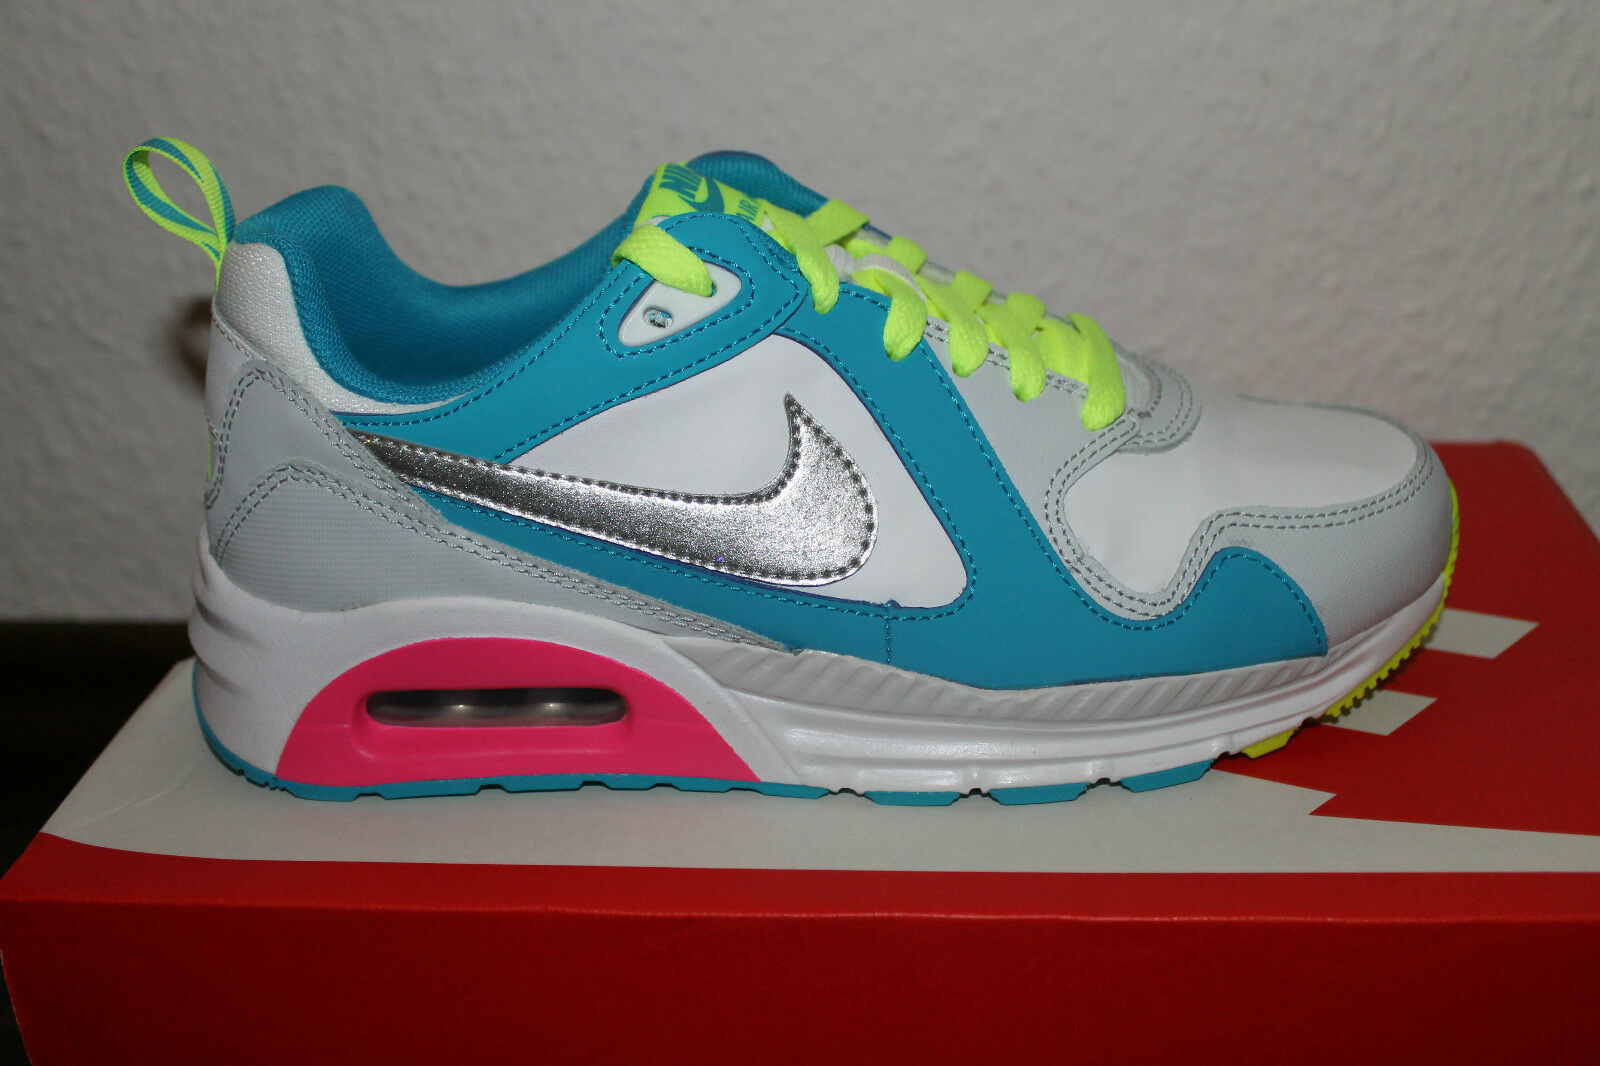 Nike Air Max Trax RUNNING pour Femmes Chaussures, coloris blanc argent bleu